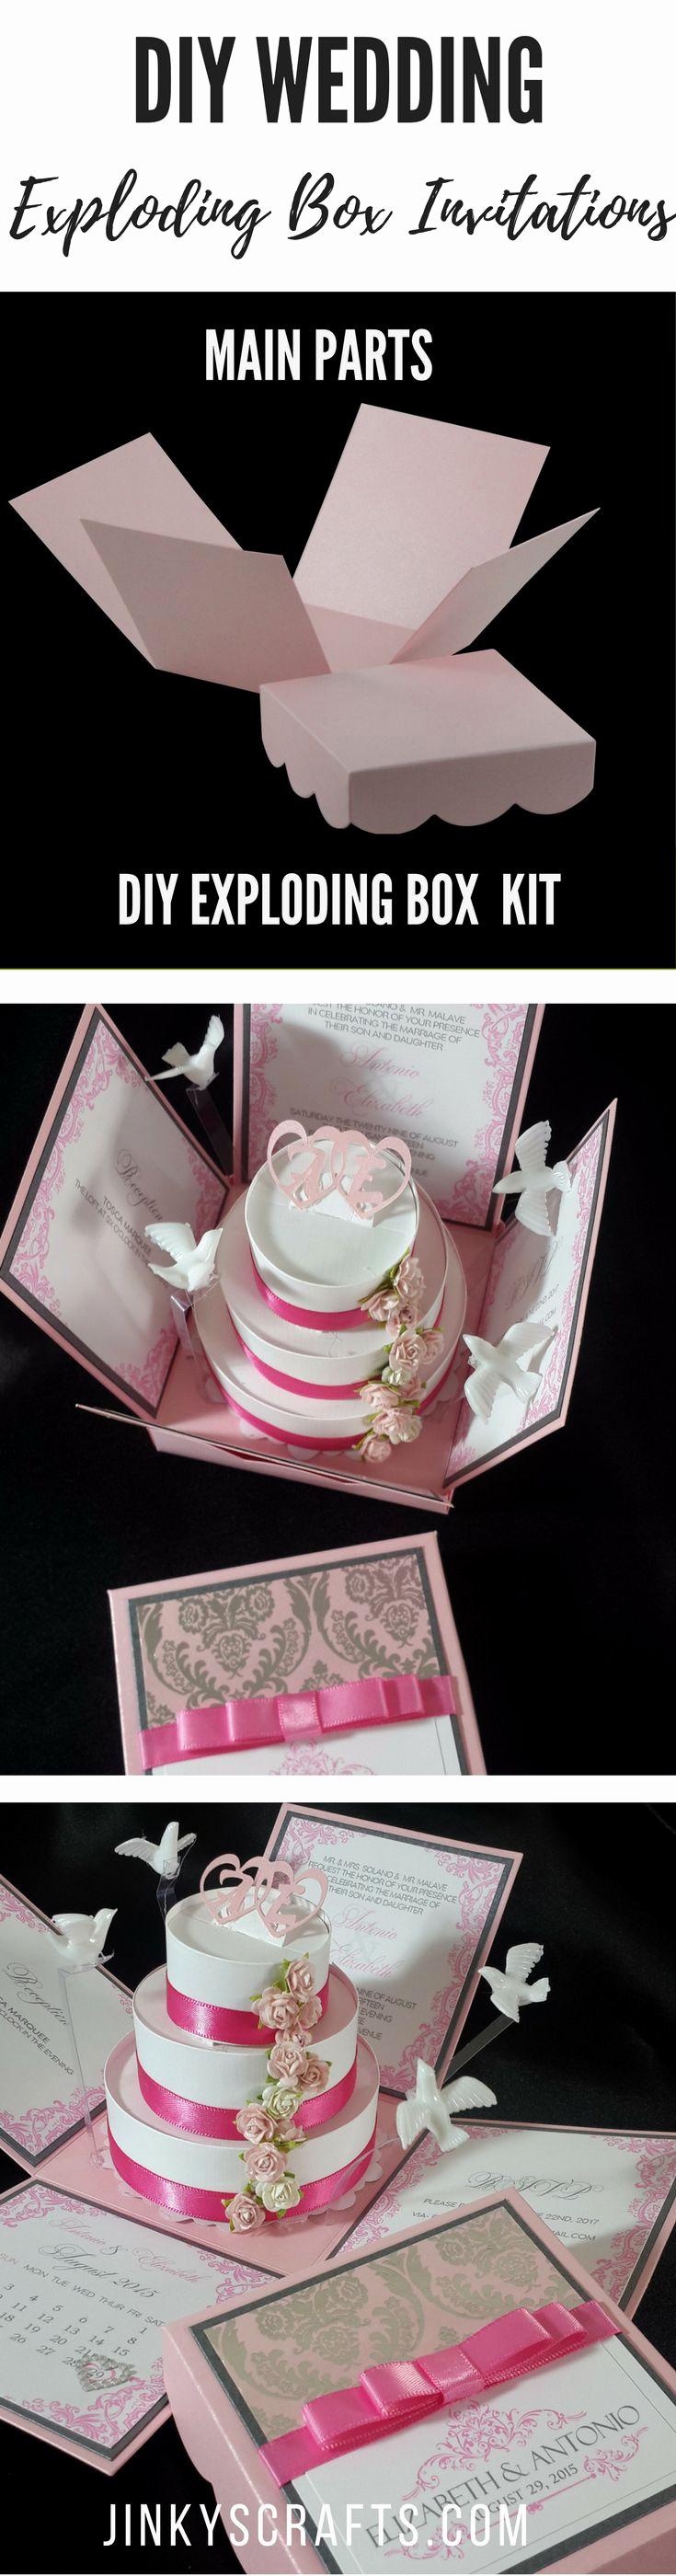 Exploding Box Invitation Kit Luxury Best 25 Box Wedding Invitations Ideas Only On Pinterest